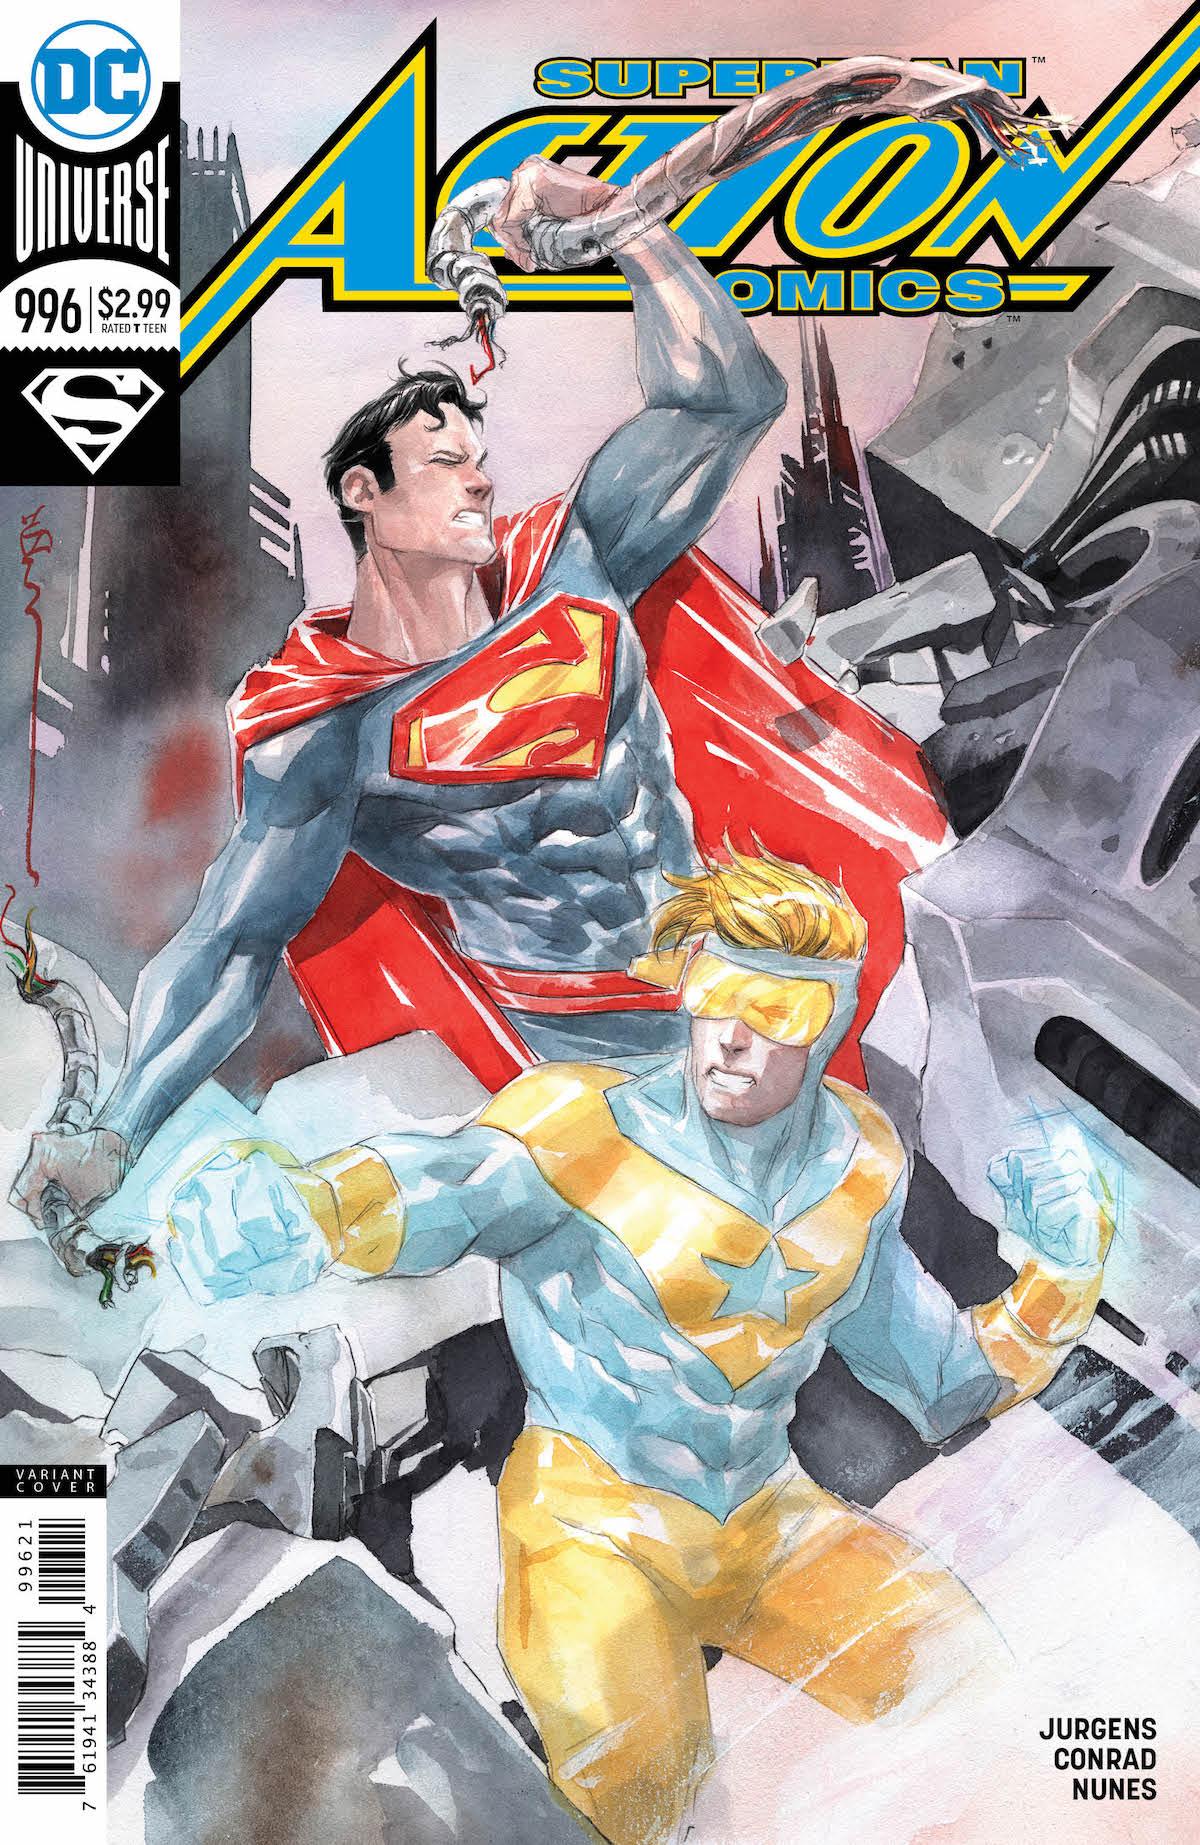 Superman: Action Comics #996 variant cover